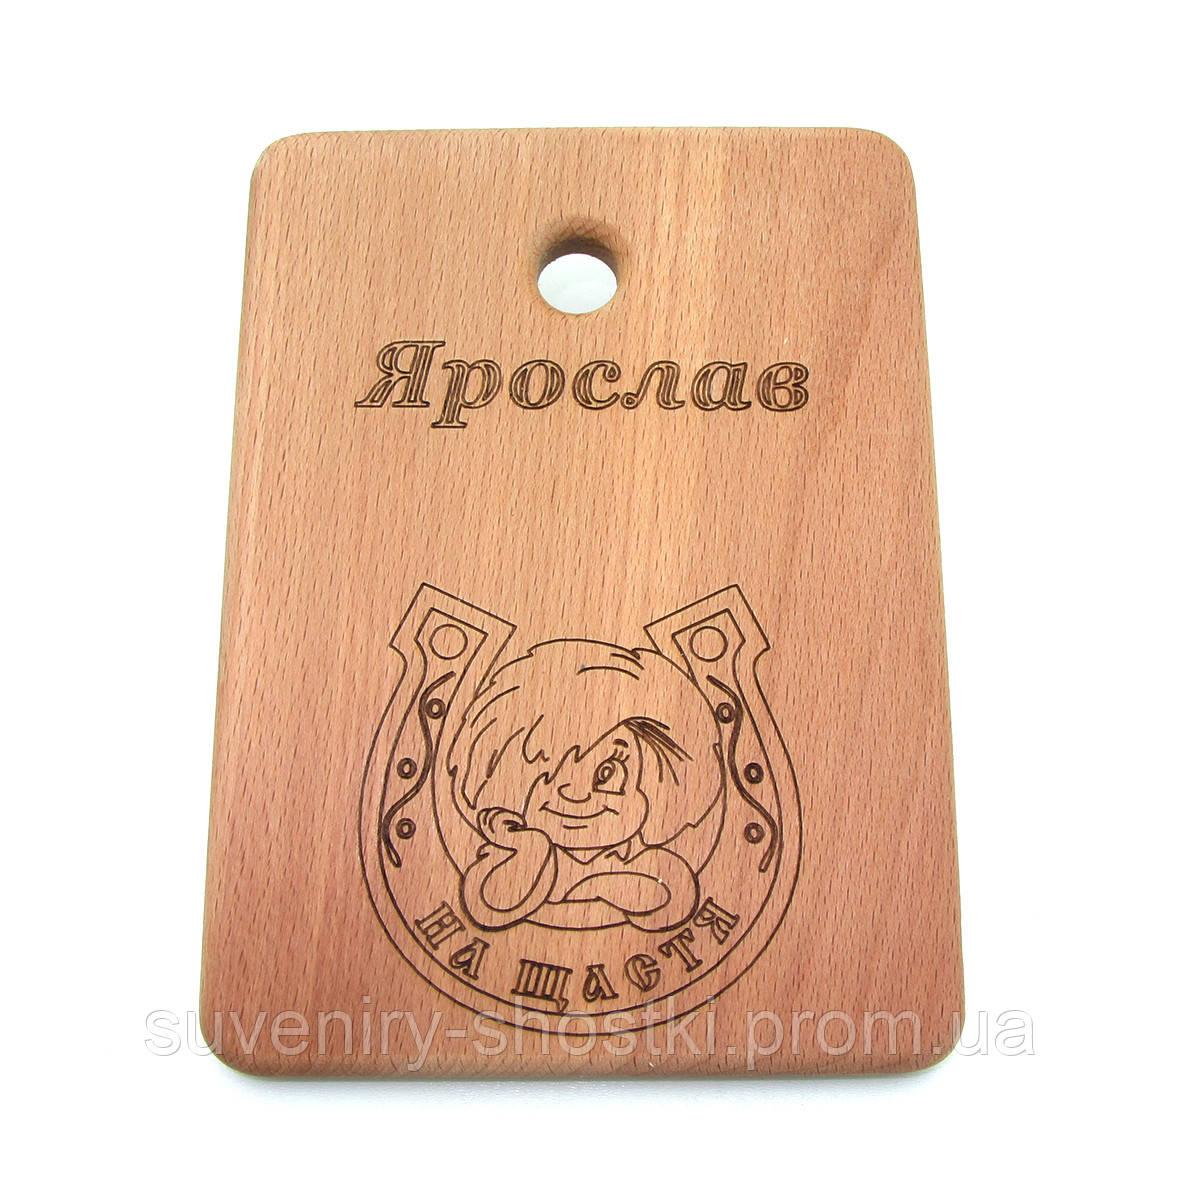 "Кухонная доска  "" Ярослав "" 310*175*15мм"